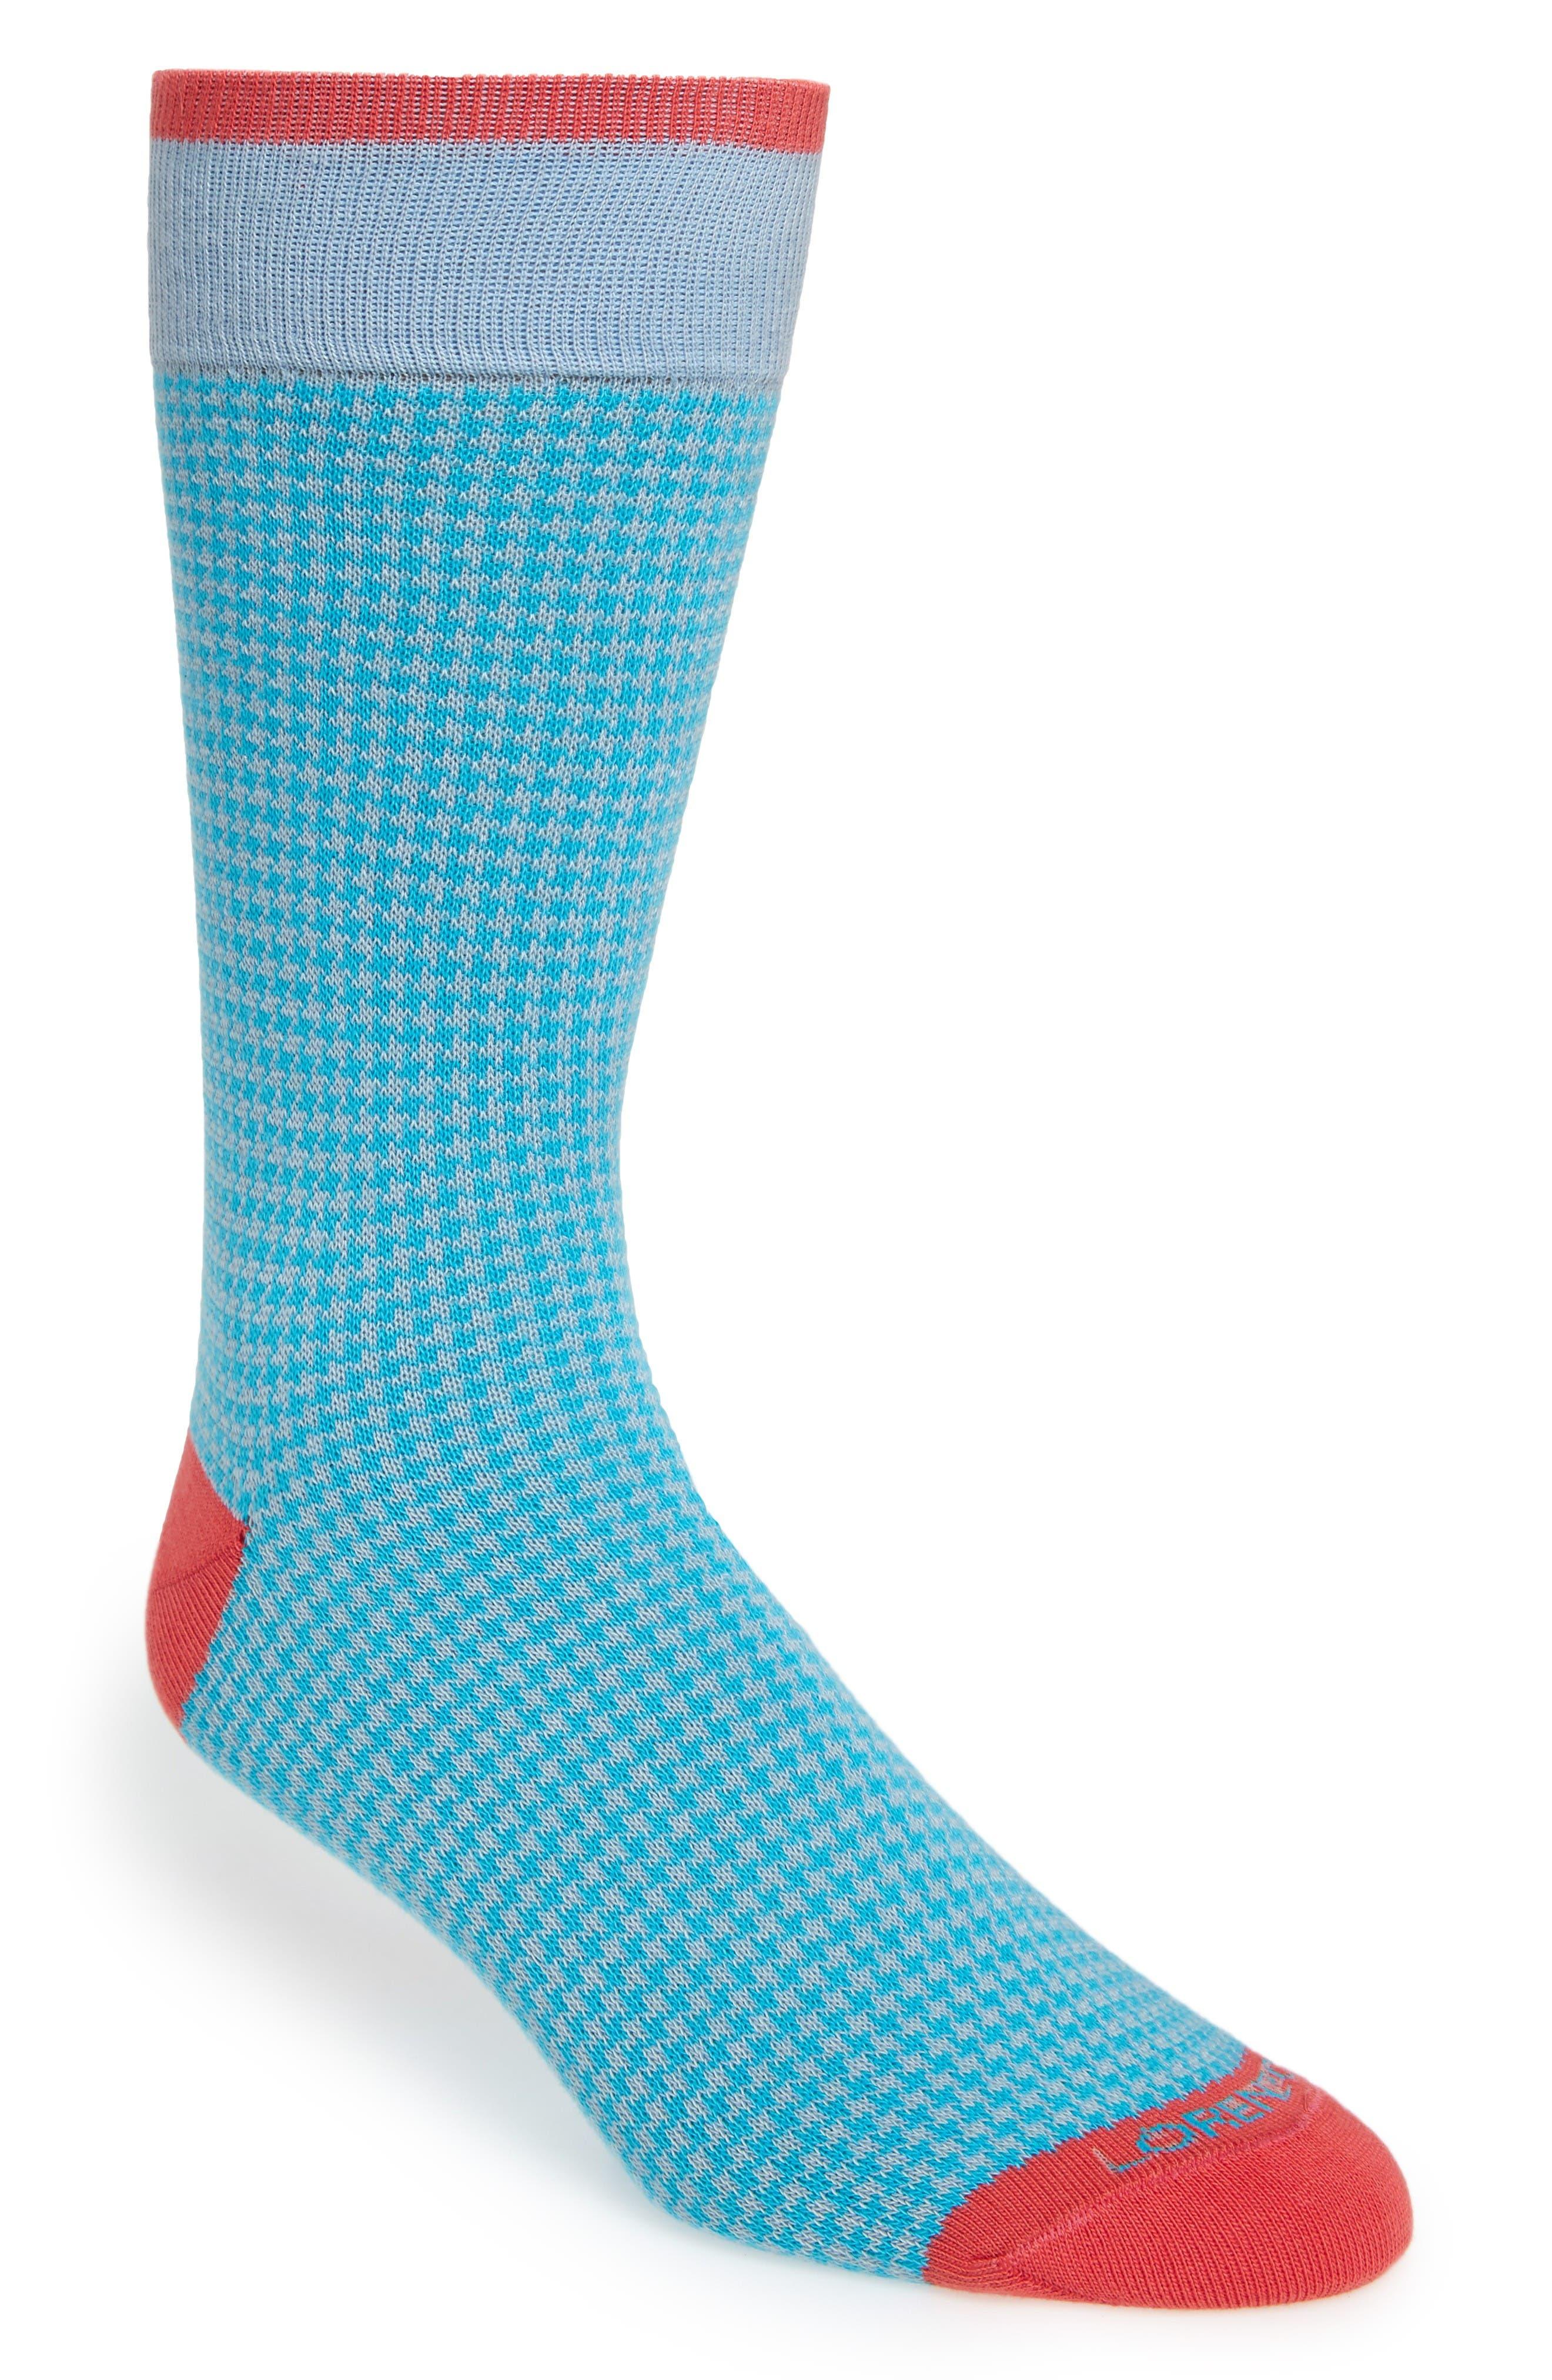 Lorenzo Uomo Houndstooth Socks